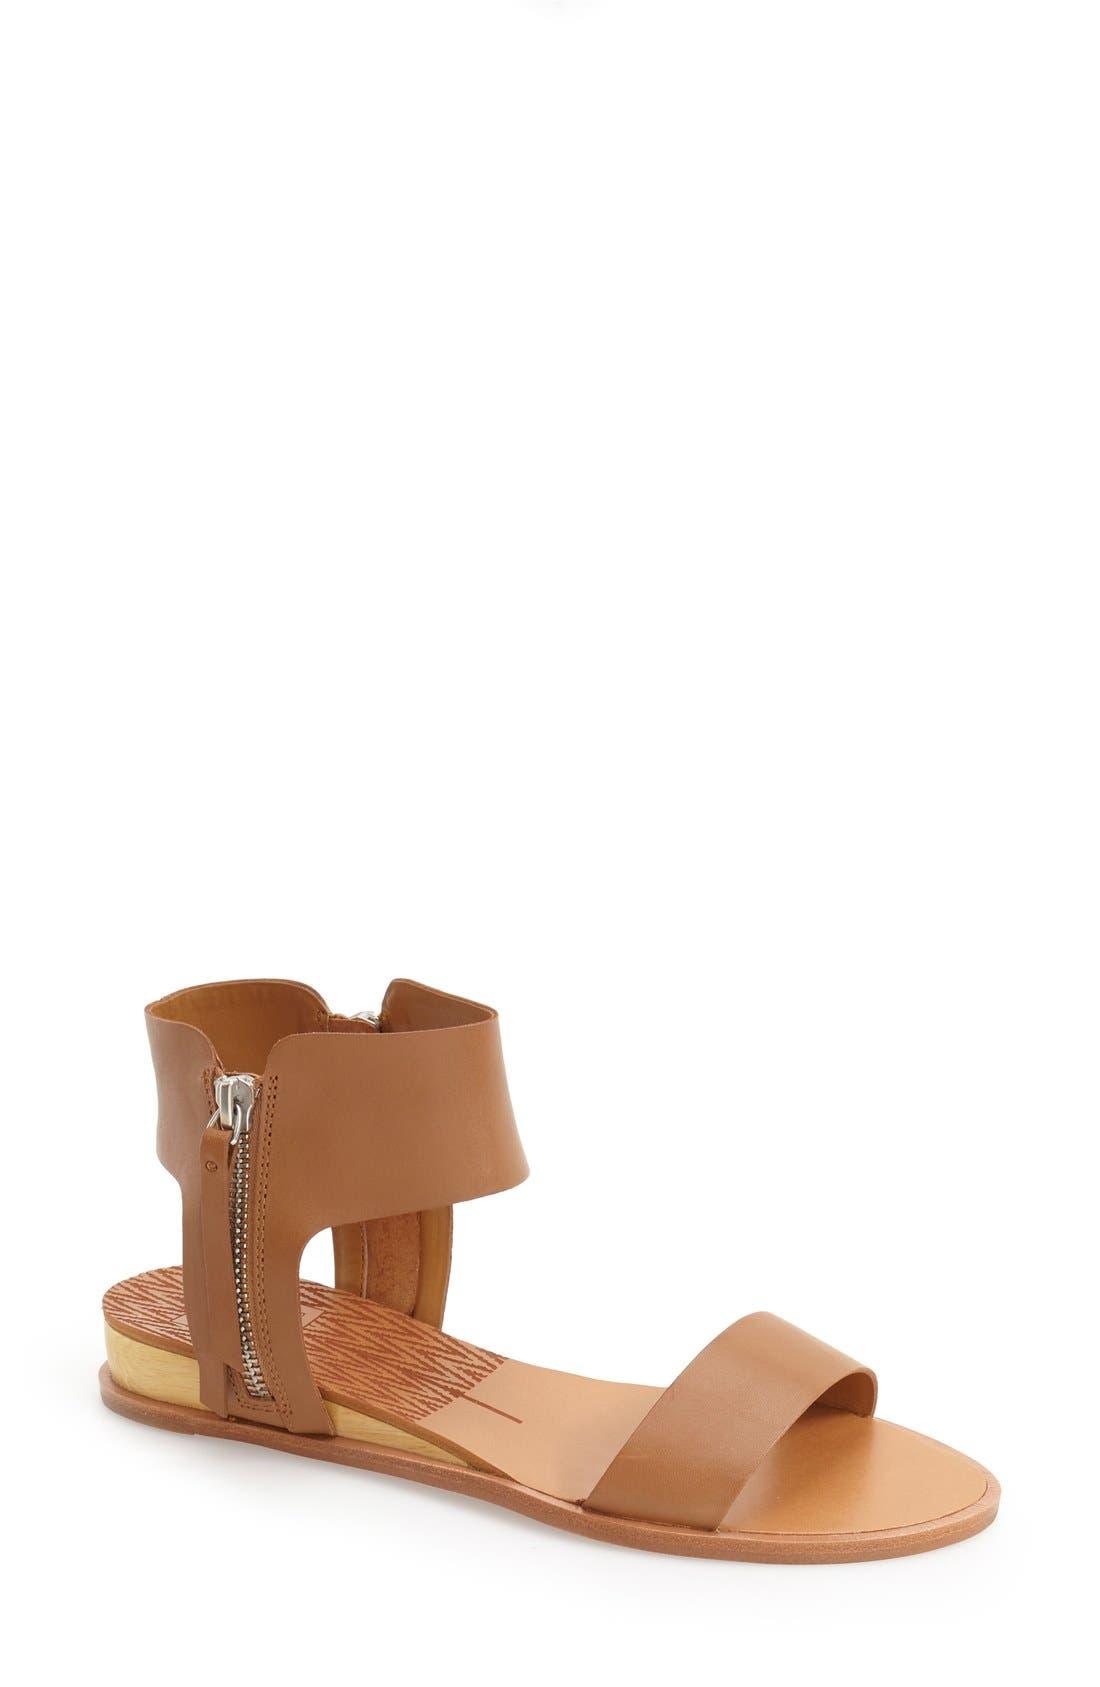 Alternate Image 1 Selected - Dolce Vita 'Paris' Ankle Cuff Sandal (Women)